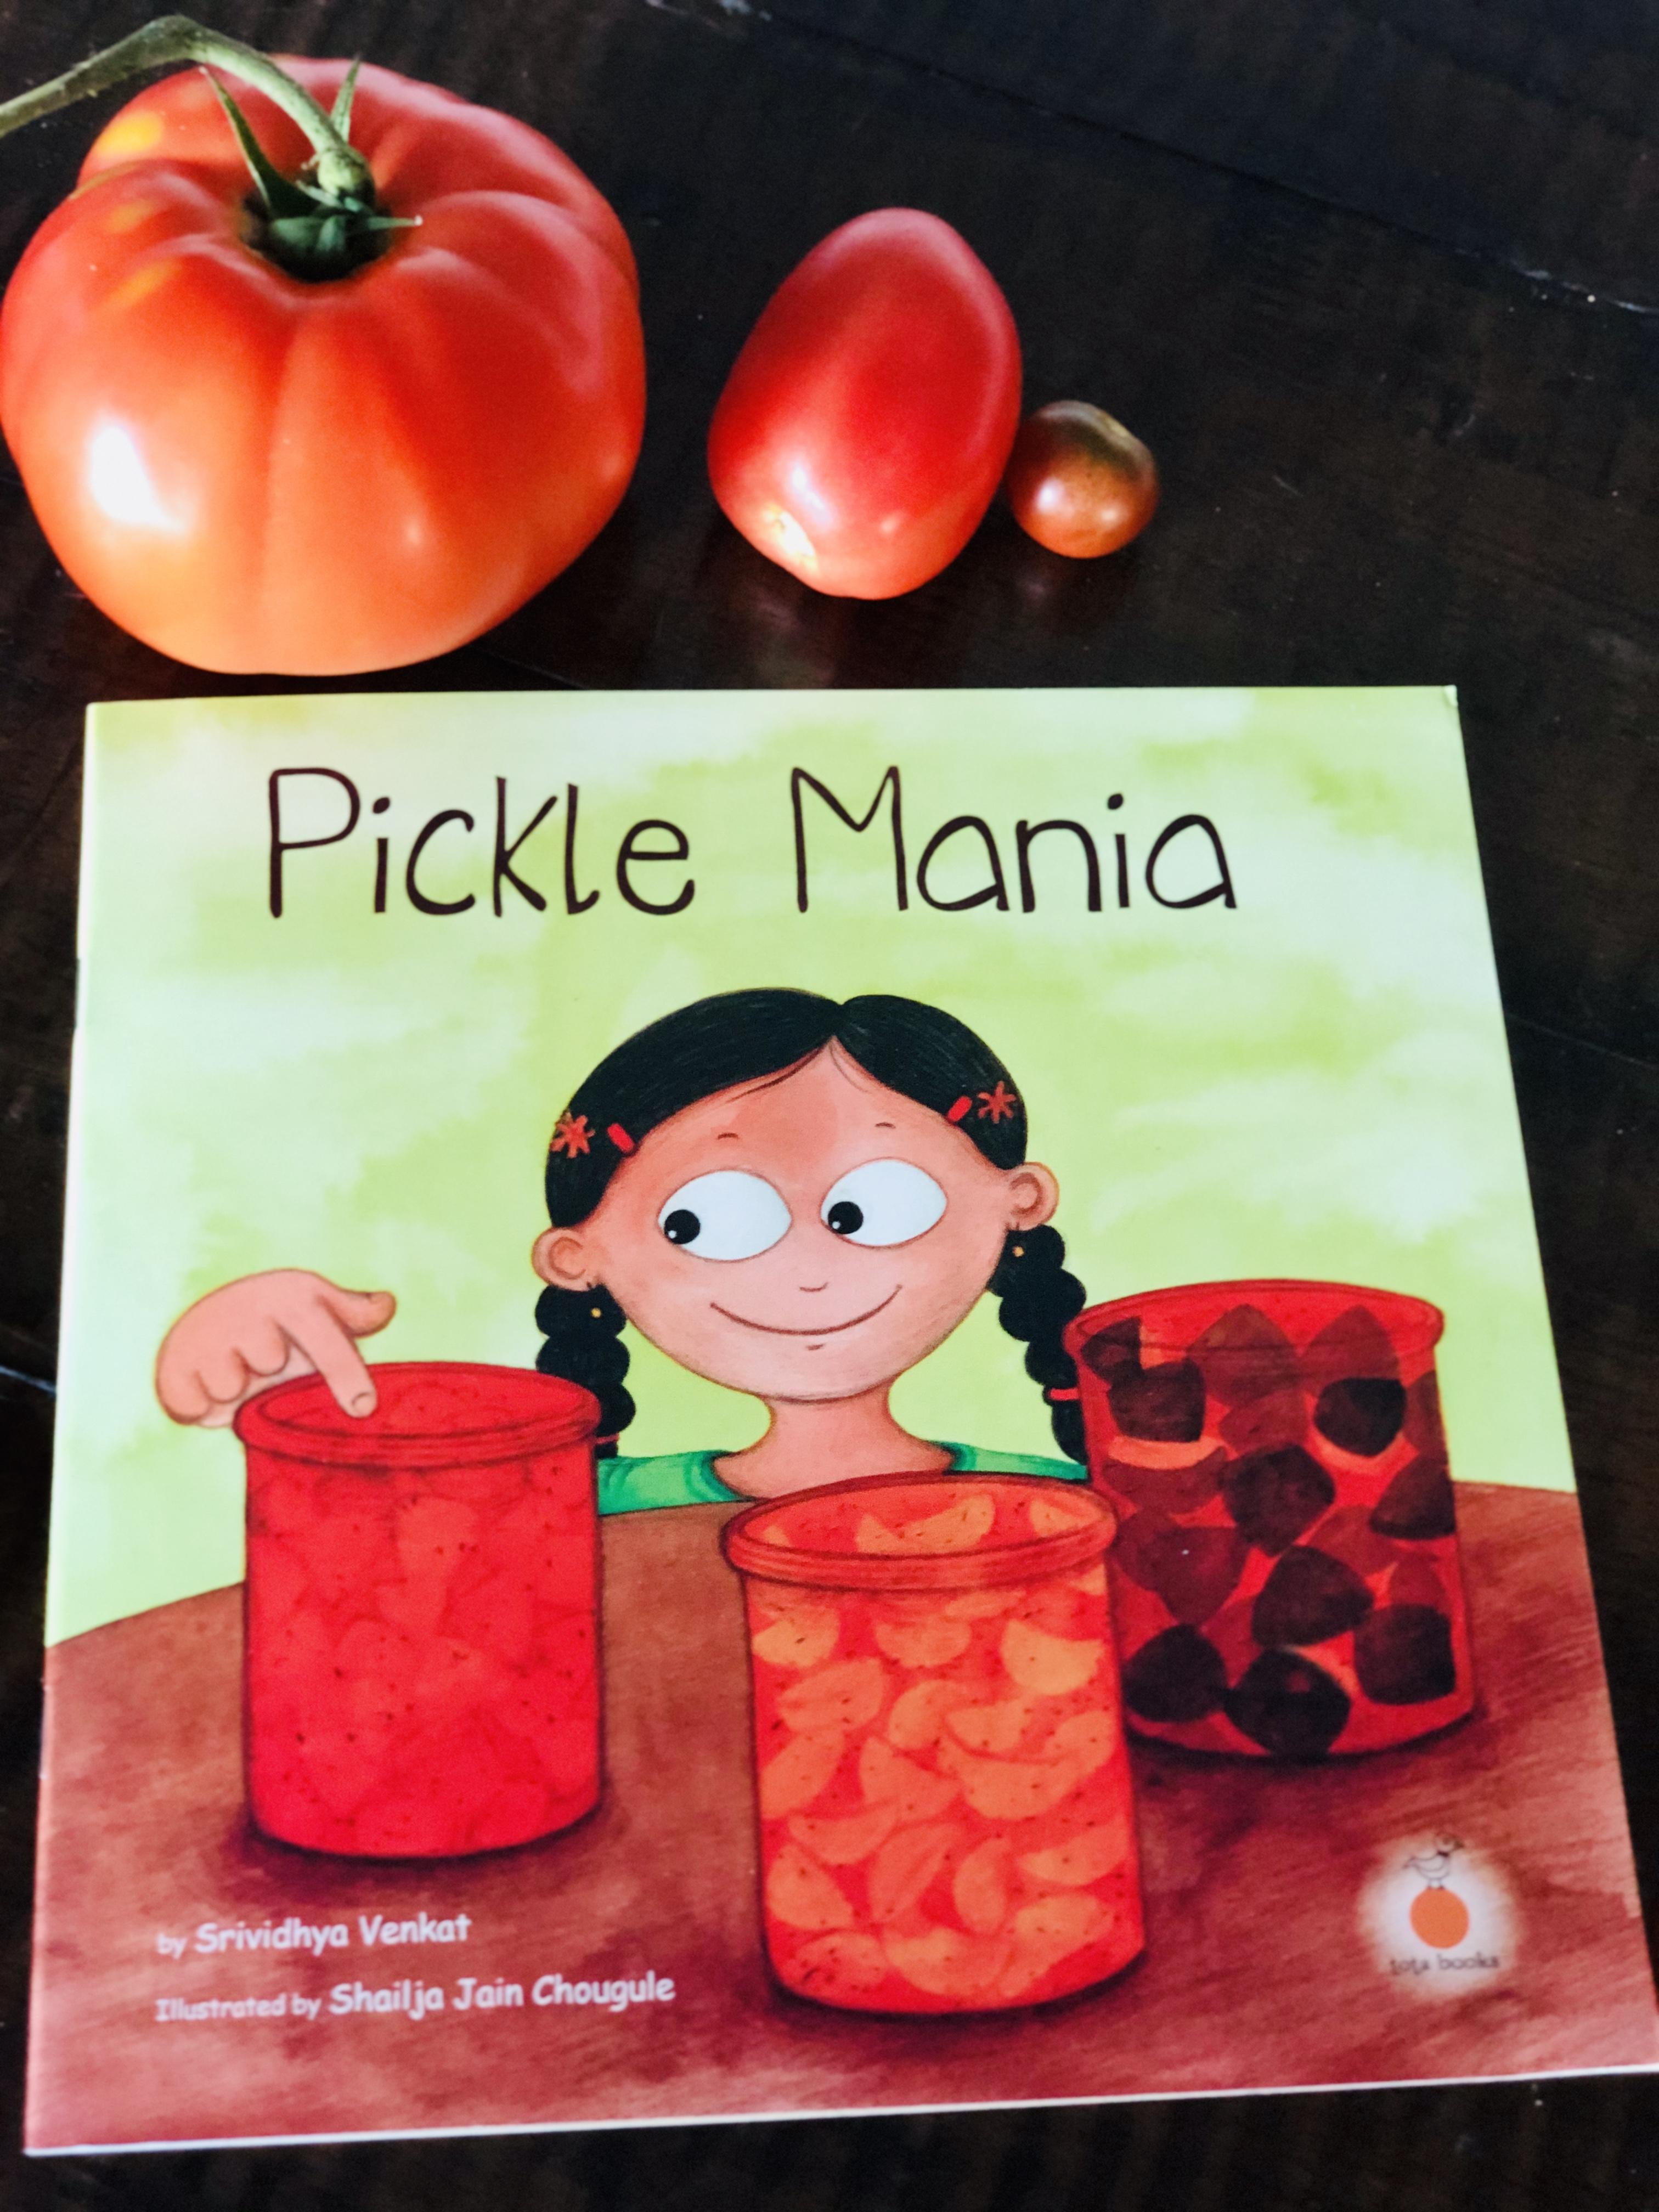 Pickle Mania